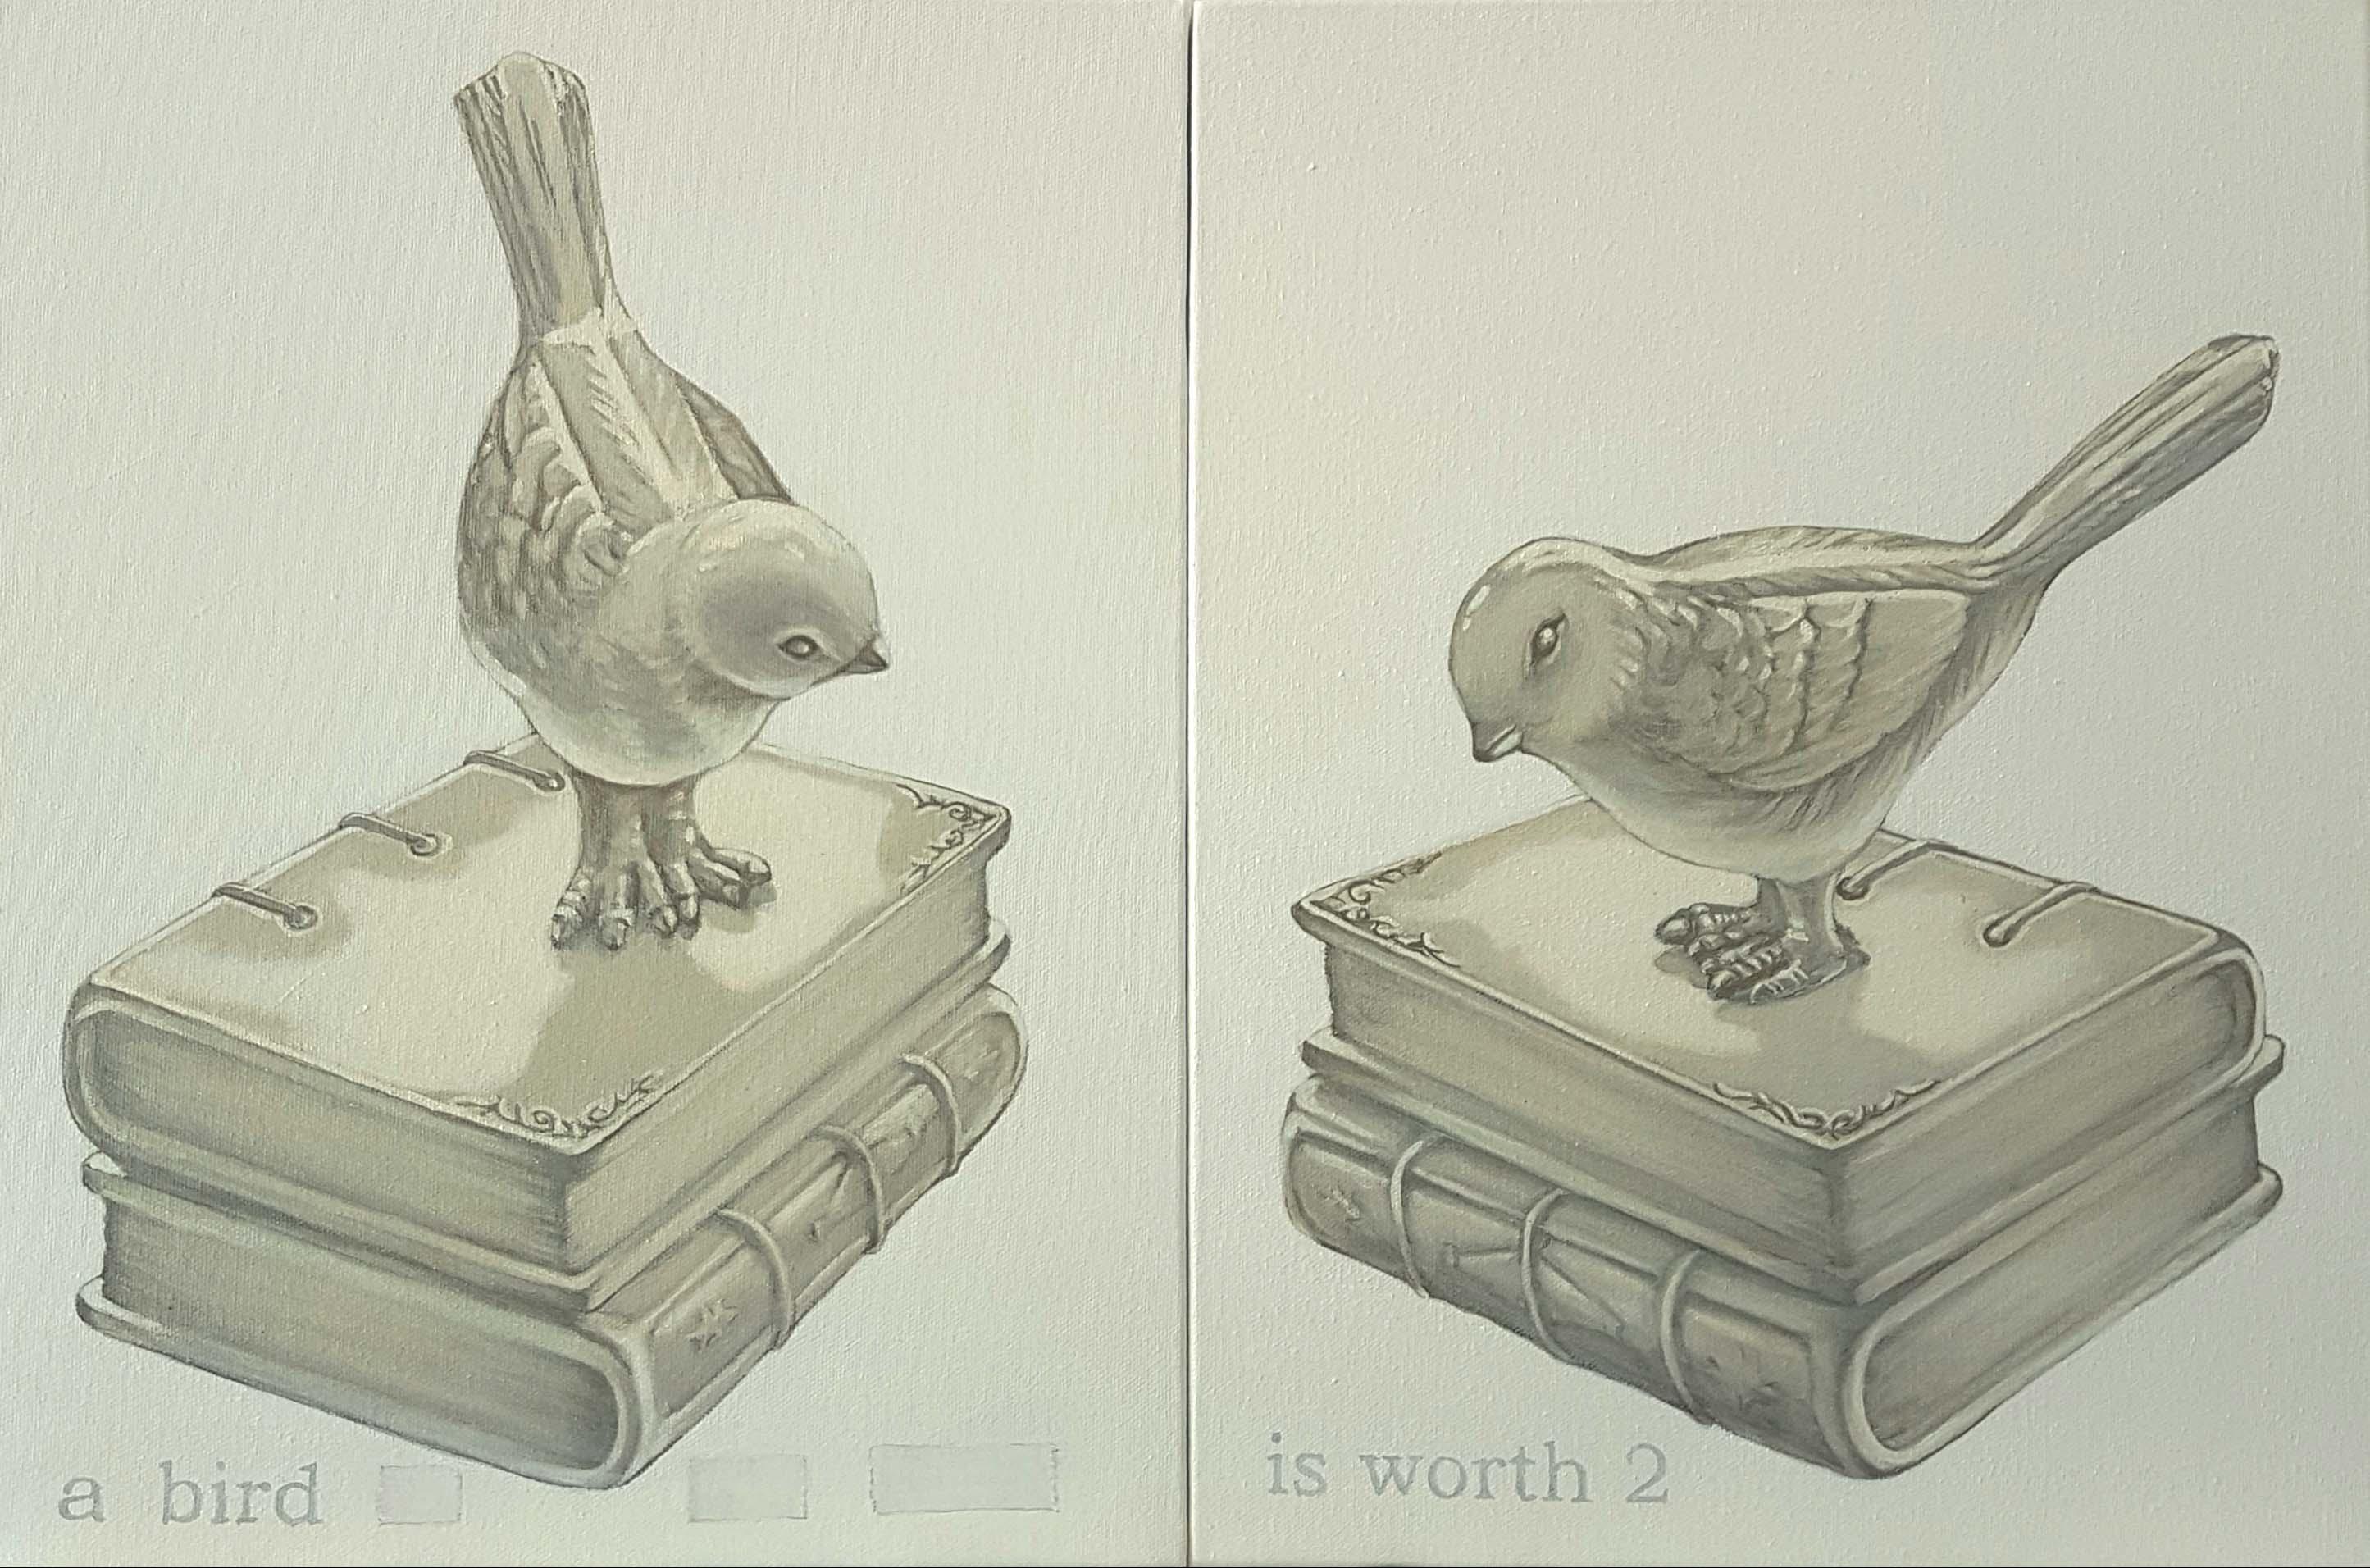 a bird is worth 2